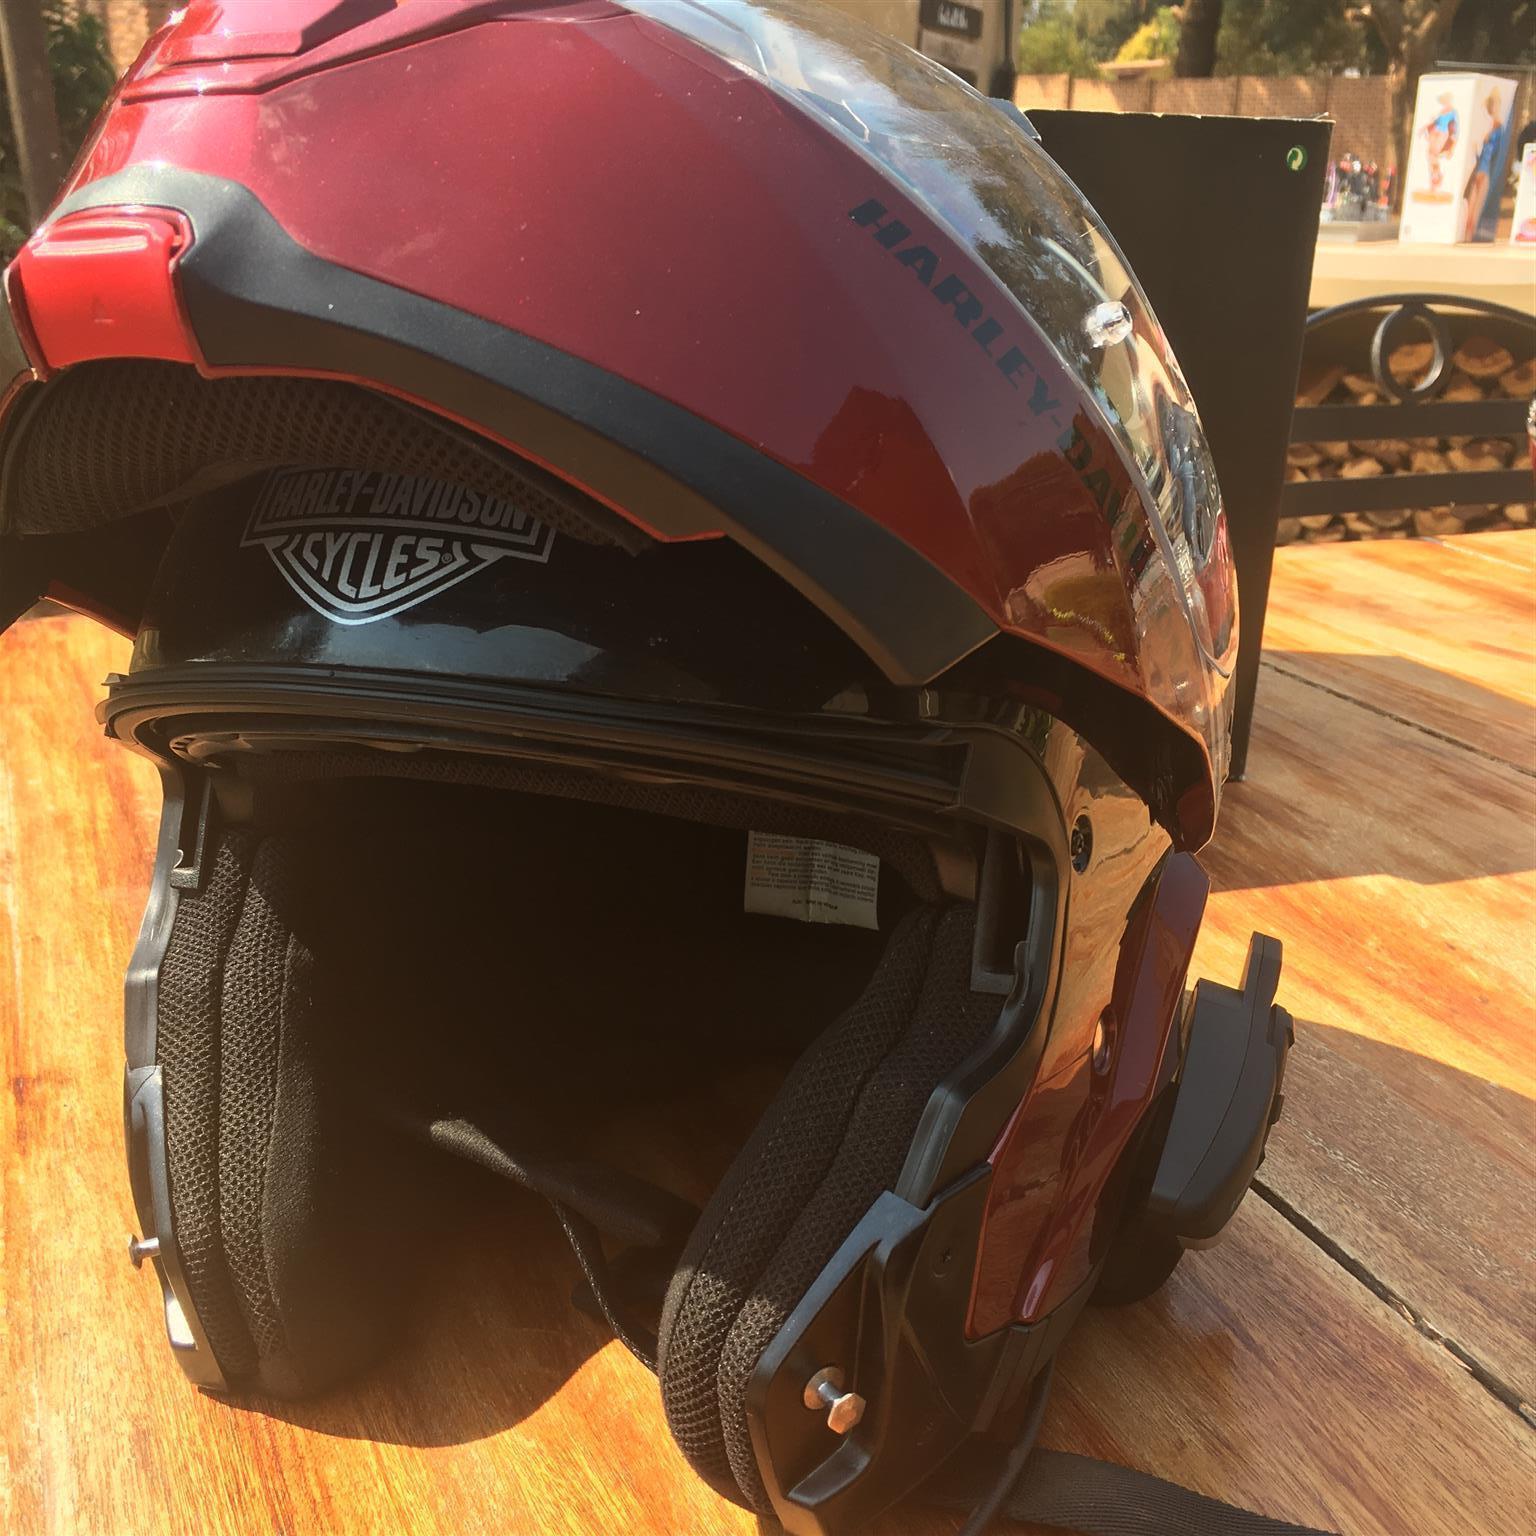 Harley-Davidson Bluetooth Enabled Helmet